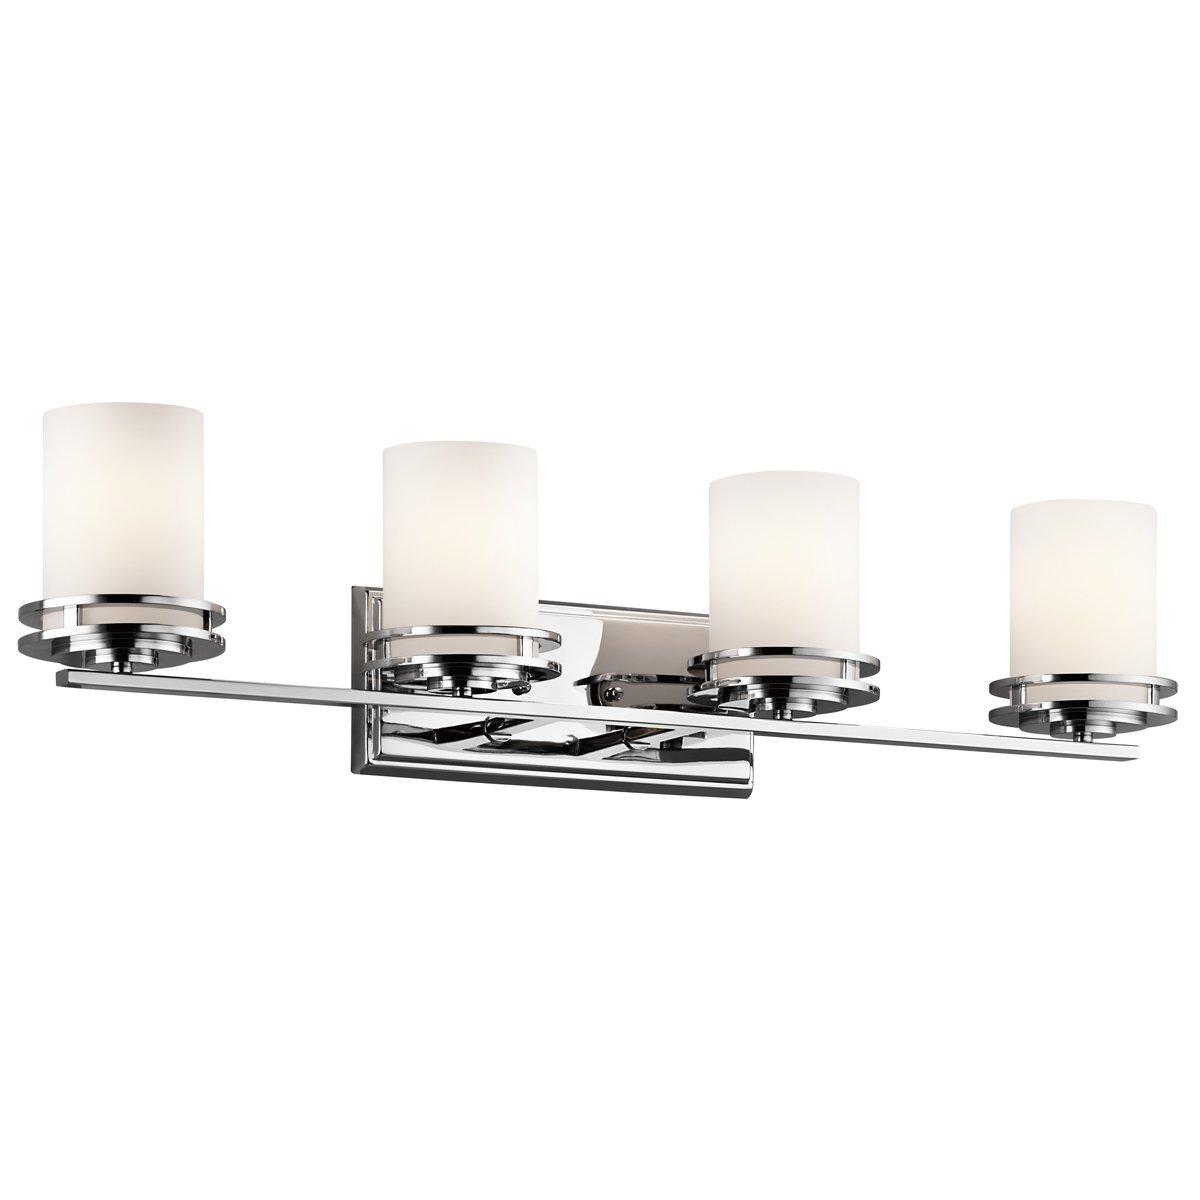 Kichler 5079CH Four Light Bath - Vanity Lighting Fixtures - Amazon.com